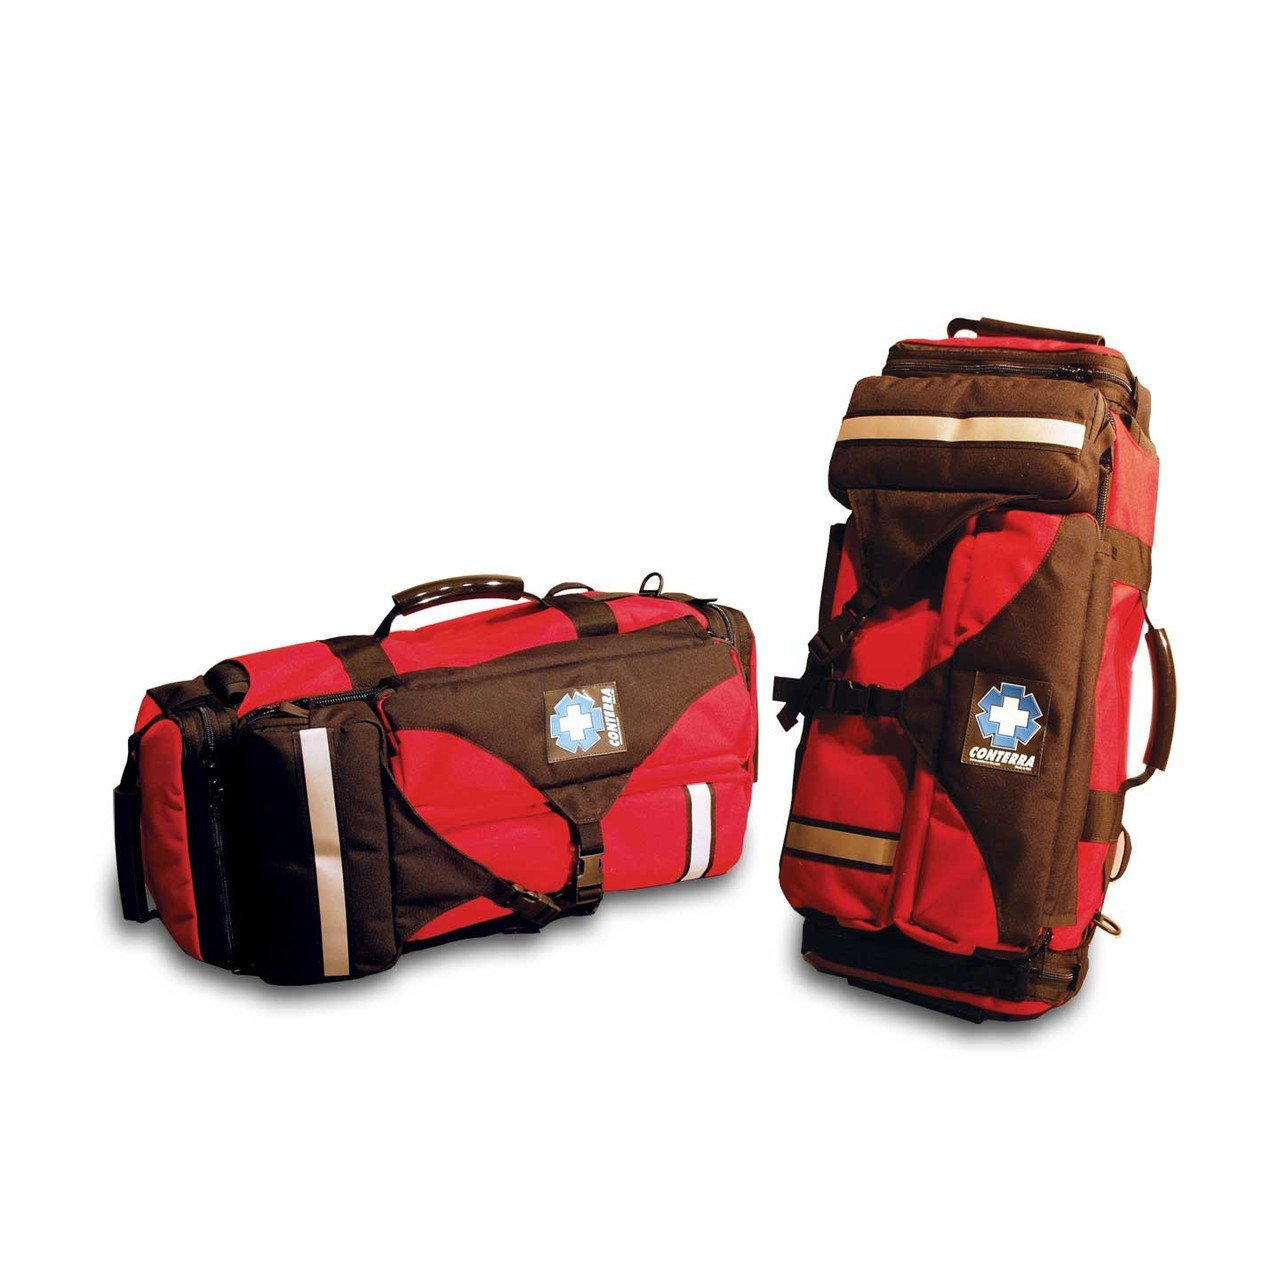 Conterra Flightline Ultra Aero-Medical Pack - RED/BLACK from Rescue Essentials by Conterra